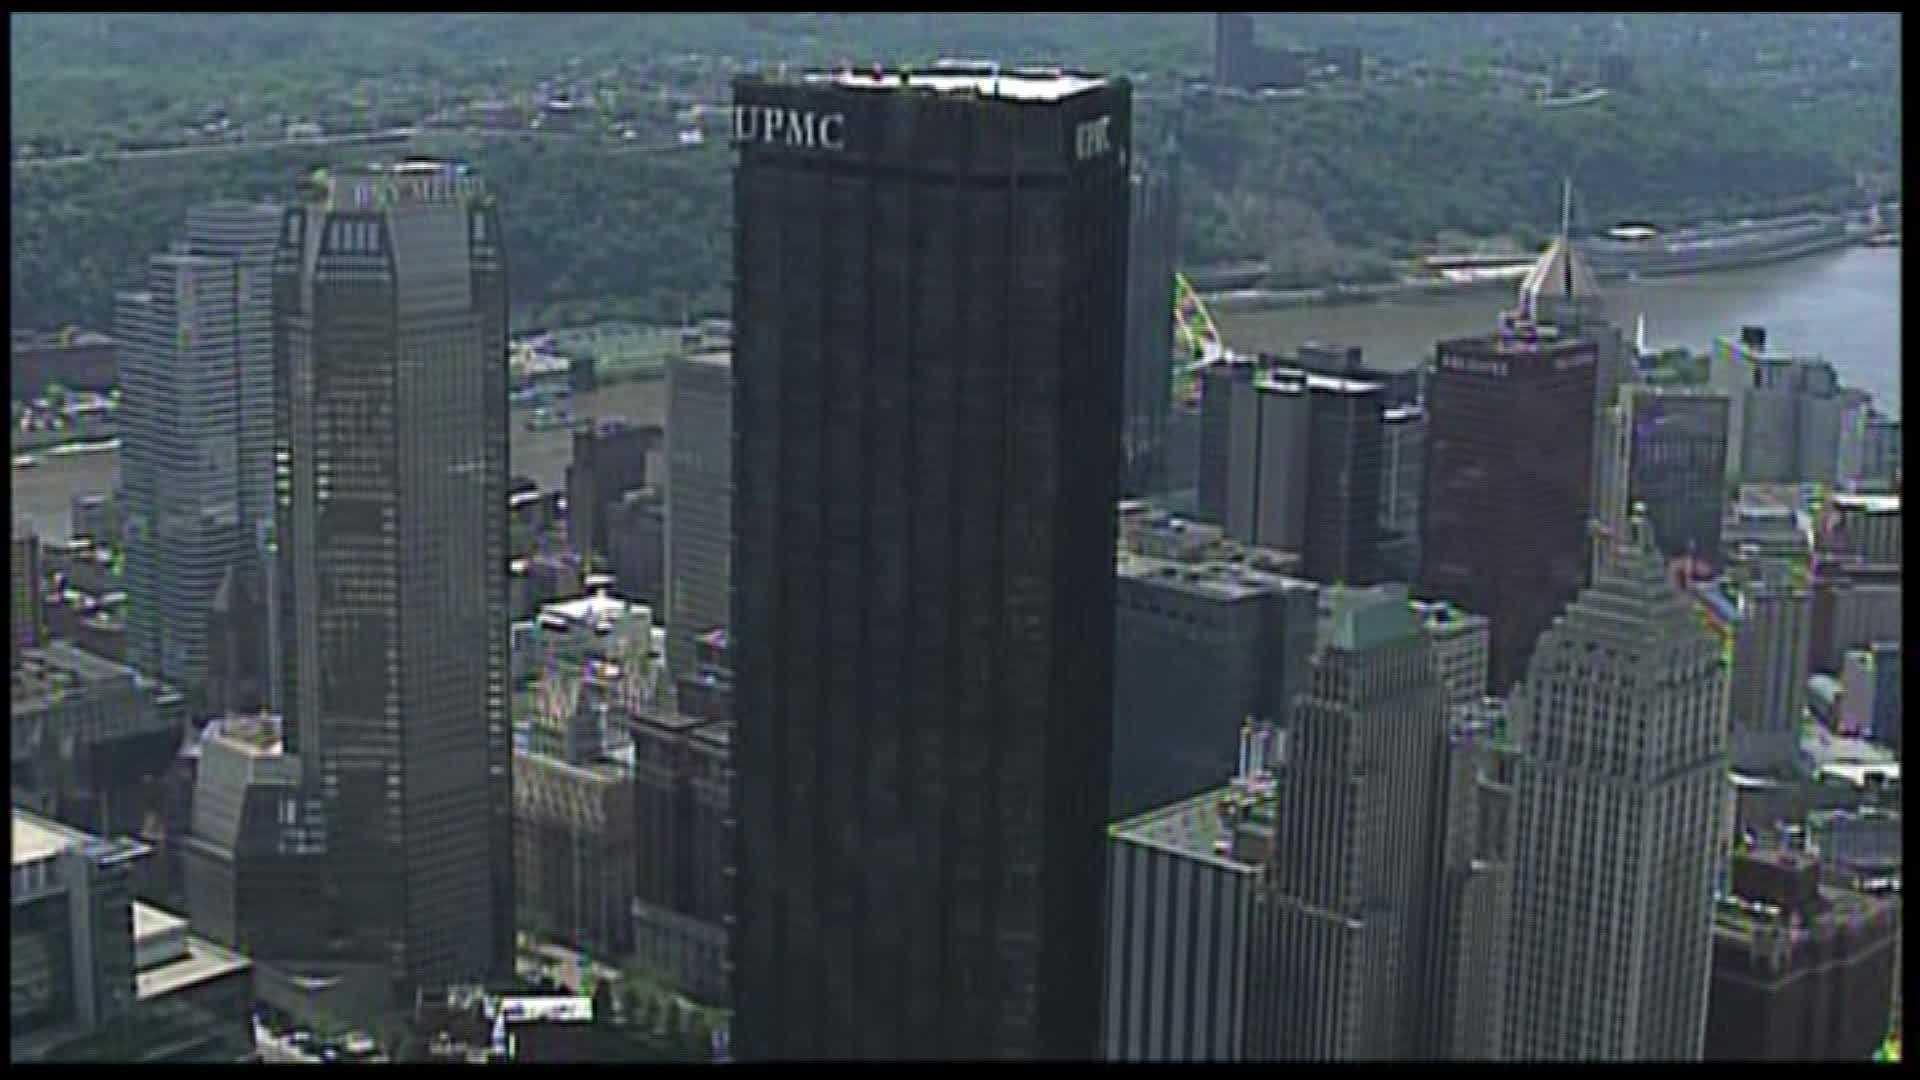 Downtown skyline U.S. Steel Tower UPMC